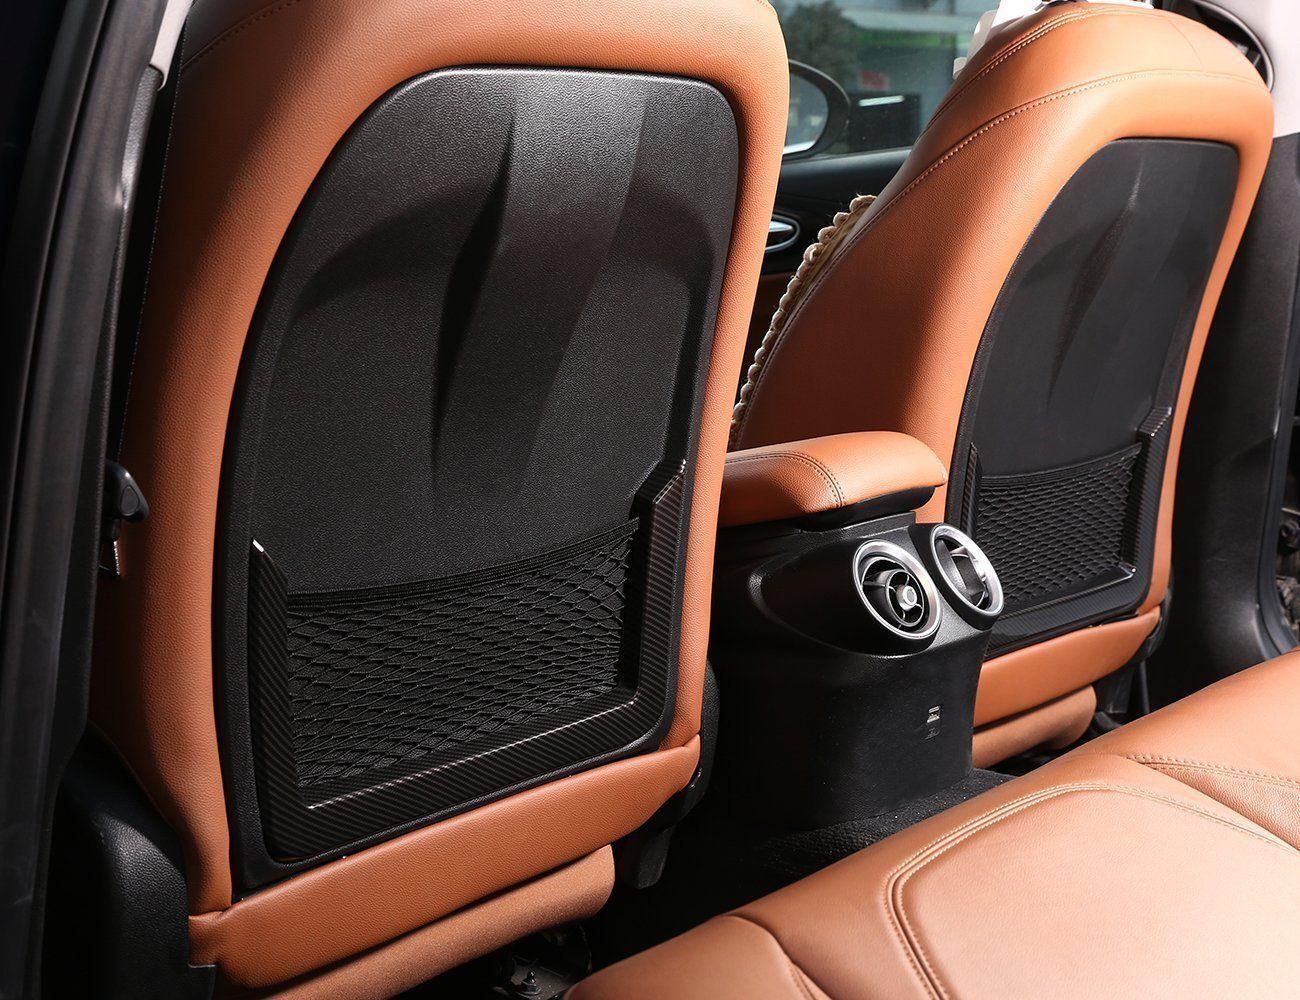 2pcs Carbon Fiber ABS Seat Back Frame Cover Trim For Alfa Romeo Giulia 2017